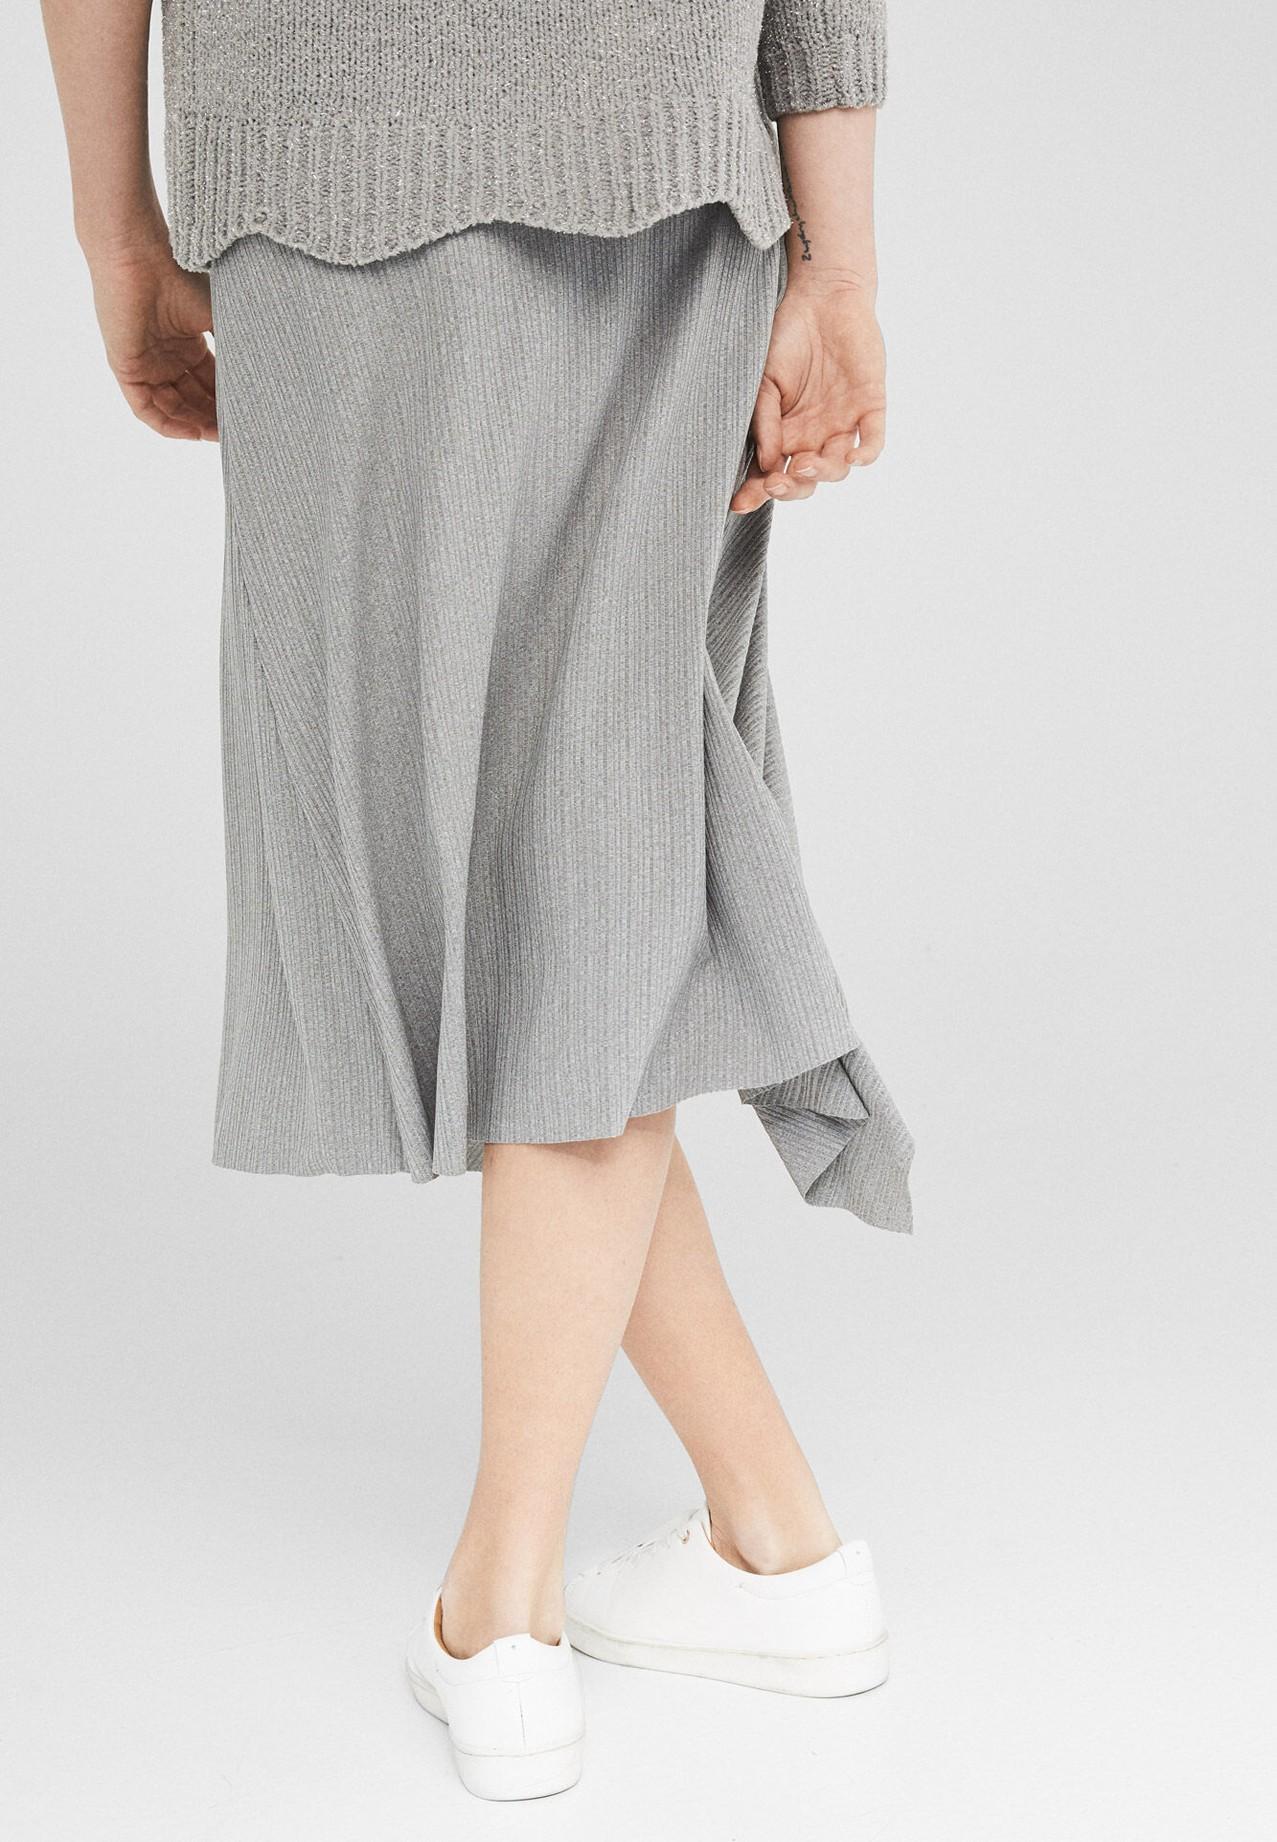 Springfield Womens Skirt Plain Dark Grey, Size S